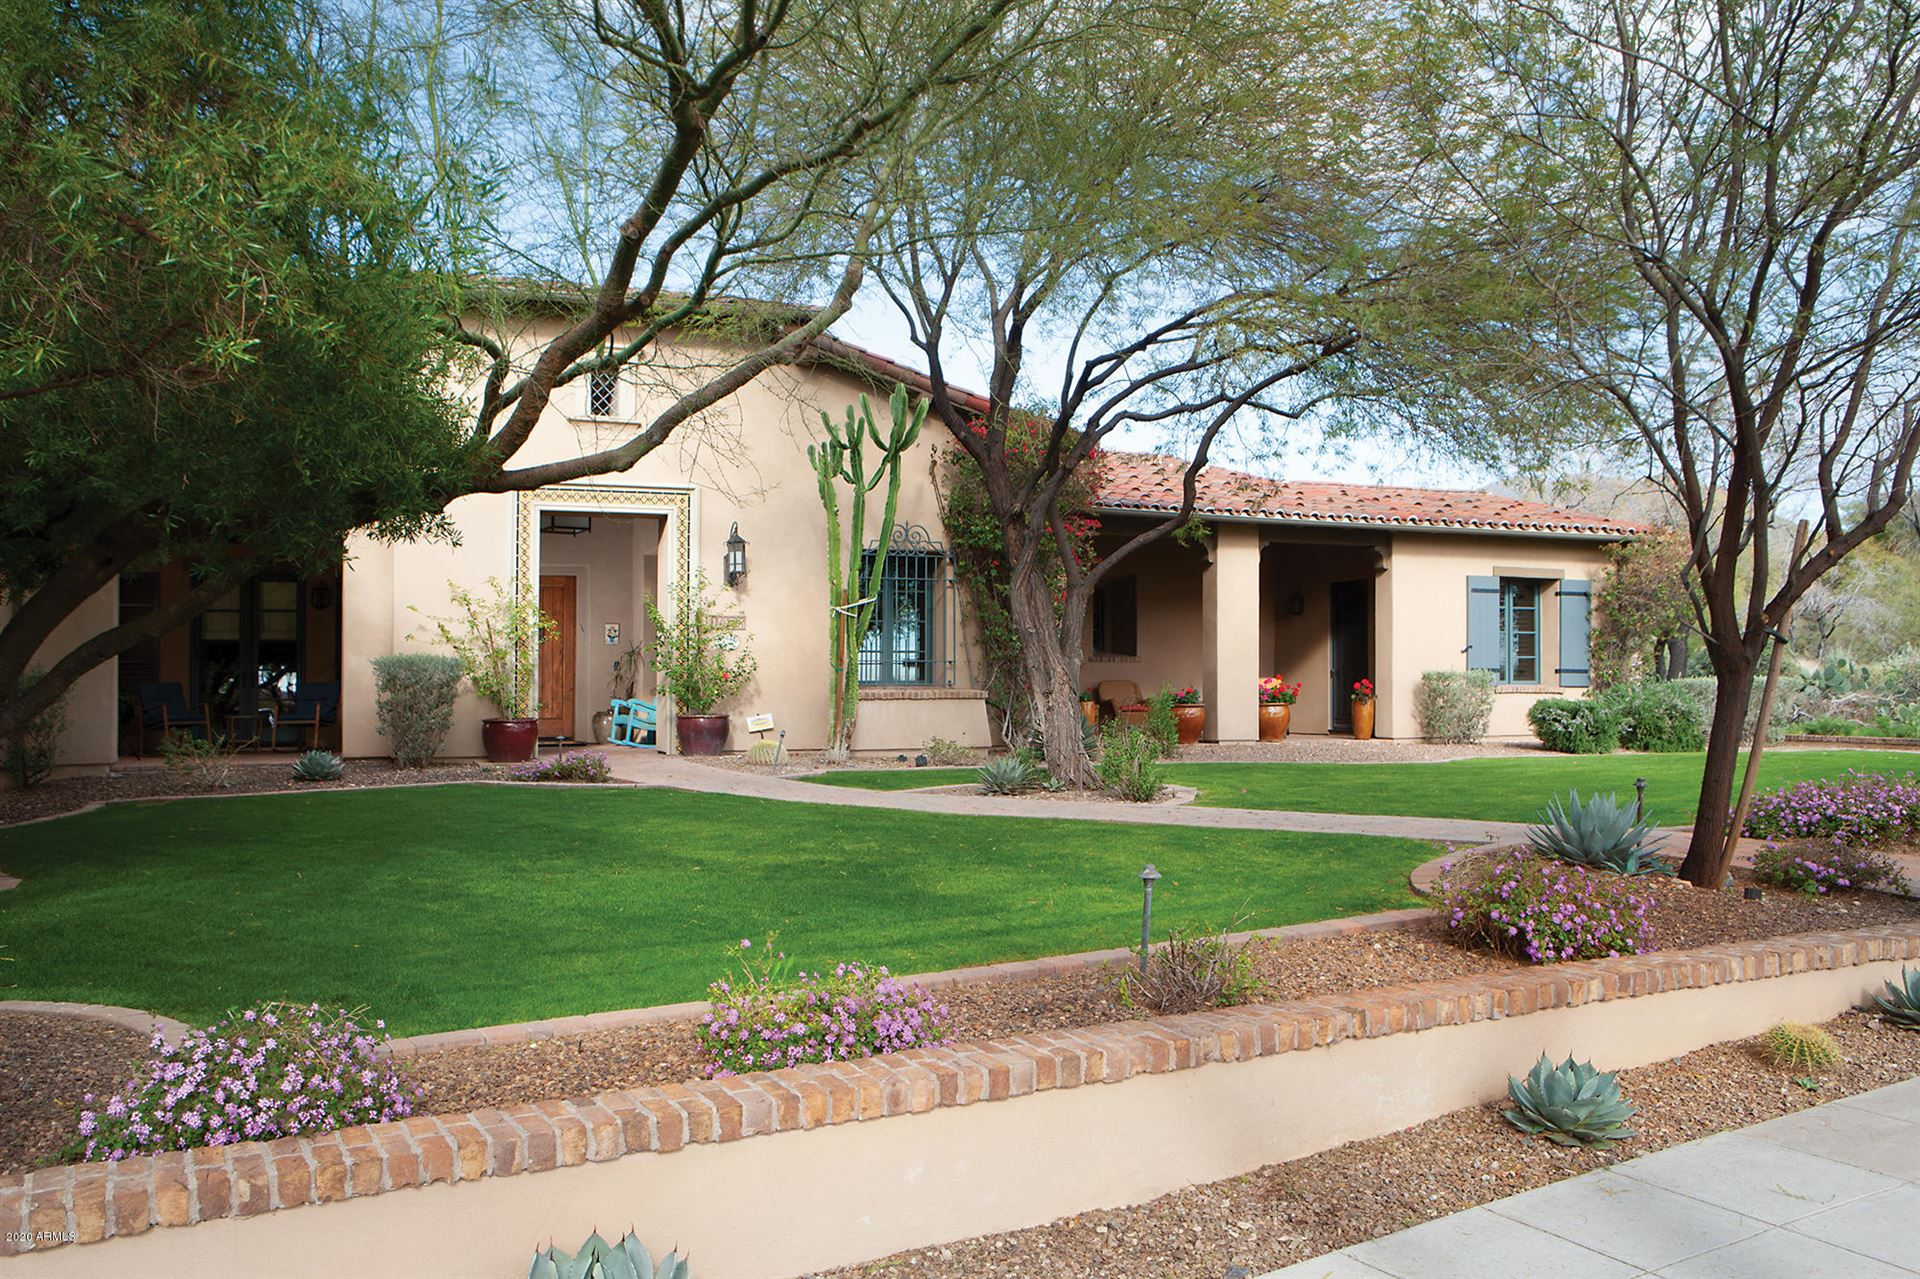 Photo of 10328 E SIERRA PINTA Drive, Scottsdale, AZ 85255 (MLS # 6200787)